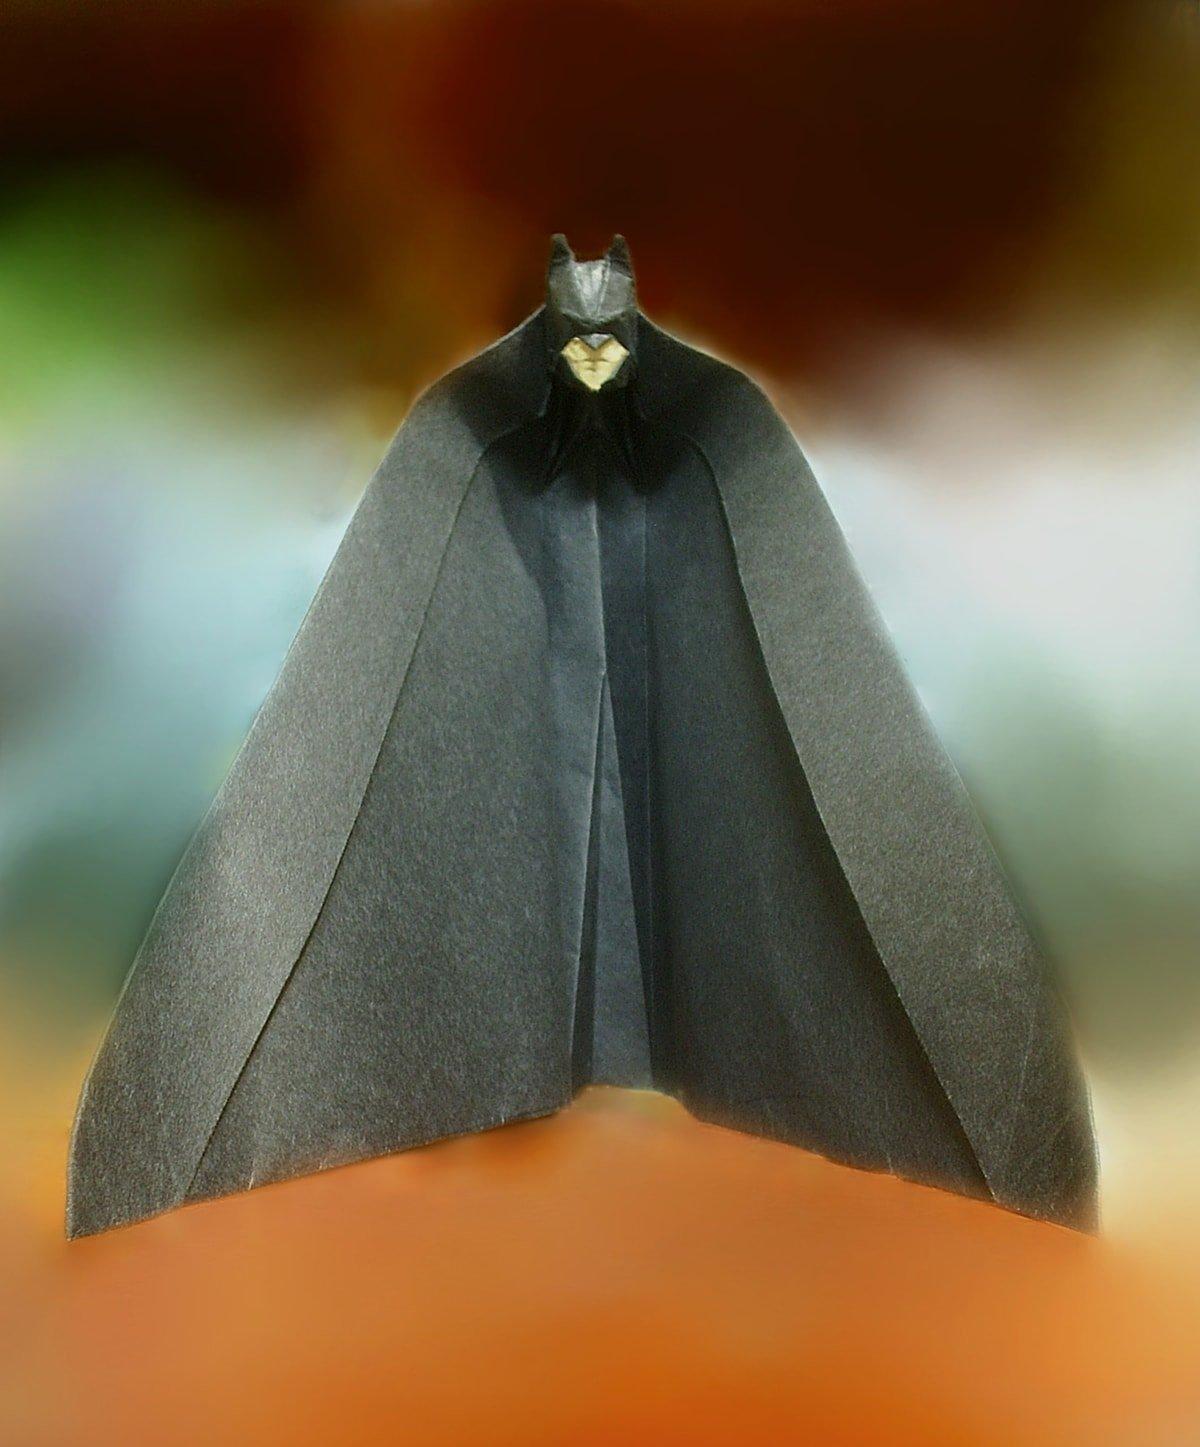 Papercraft Batman by Jackie Yang